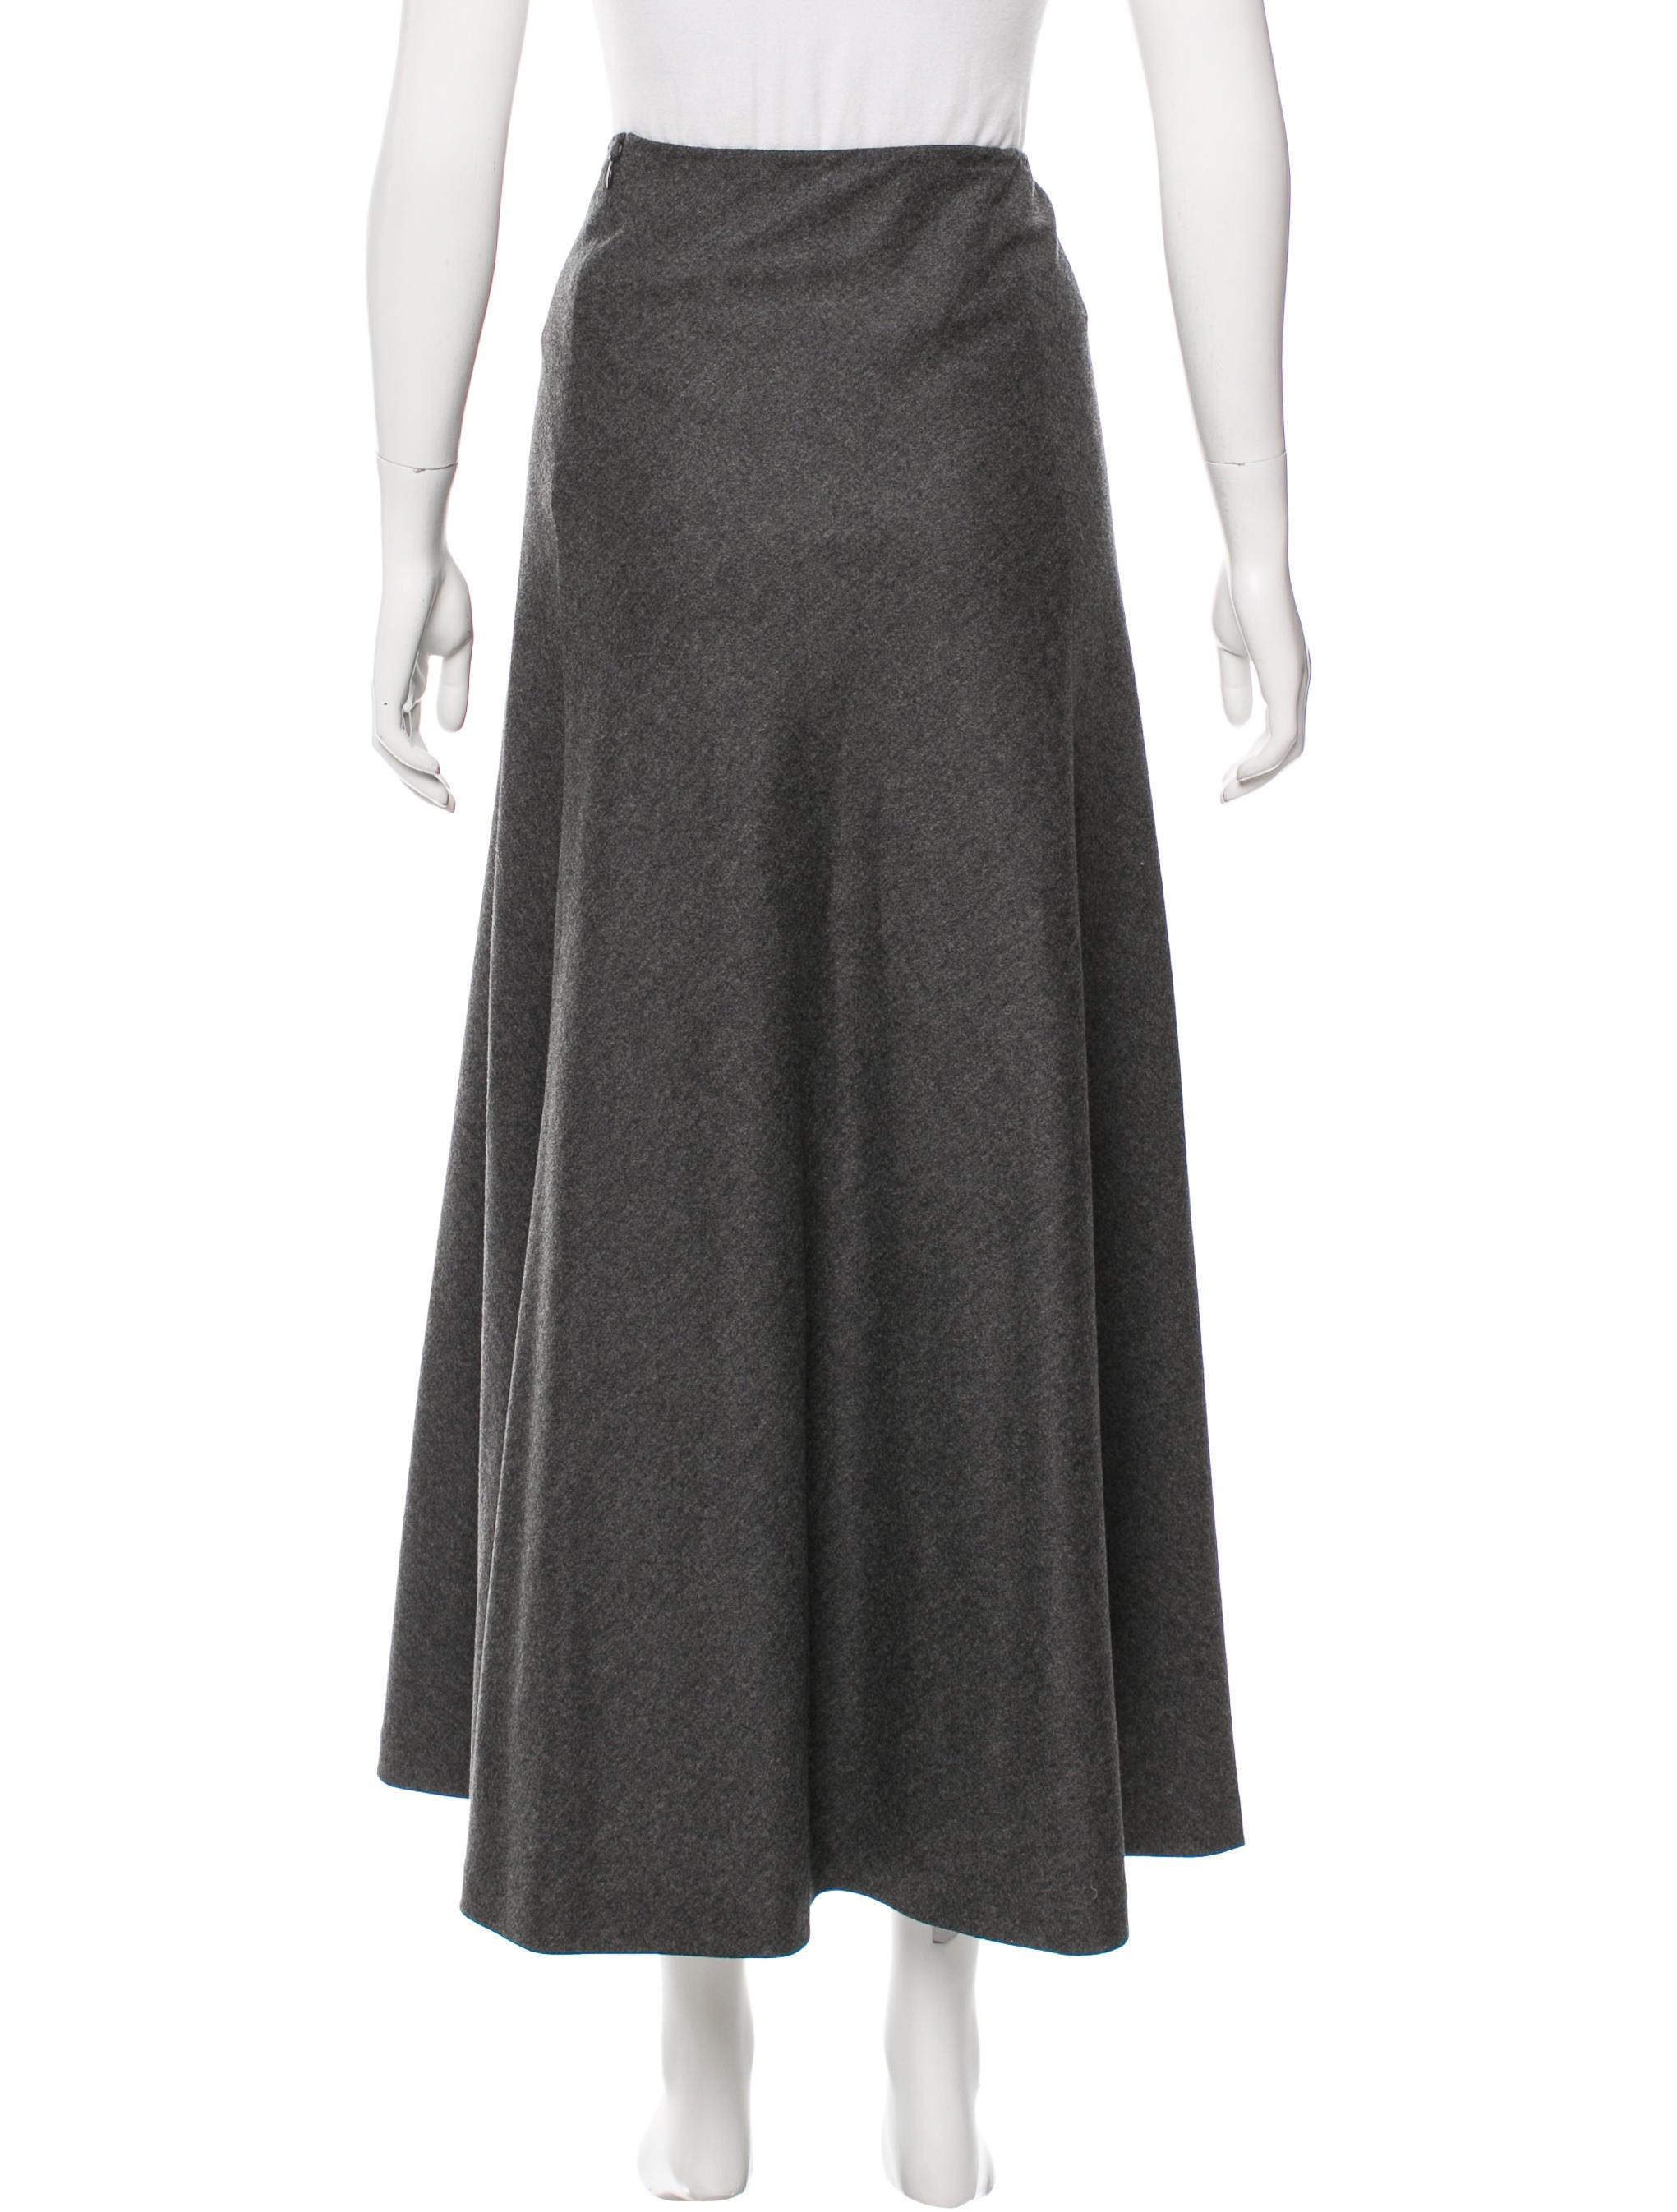 prada wool midi skirt clothing pra132491 the realreal